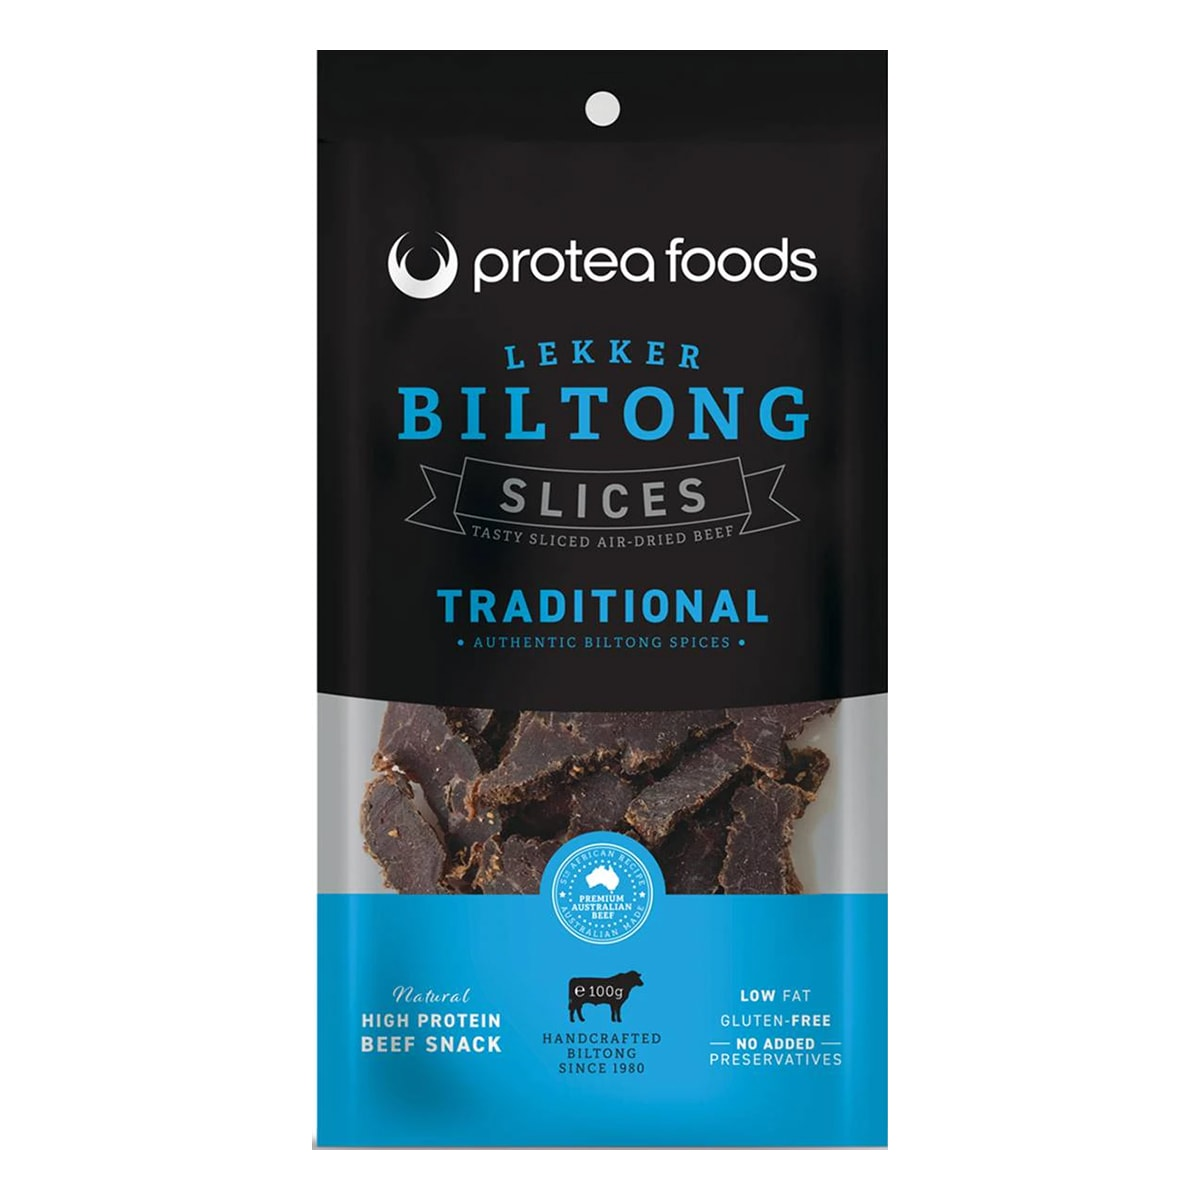 Buy Protea Foods Lekker Biltong Slices Traditional - 100 gm